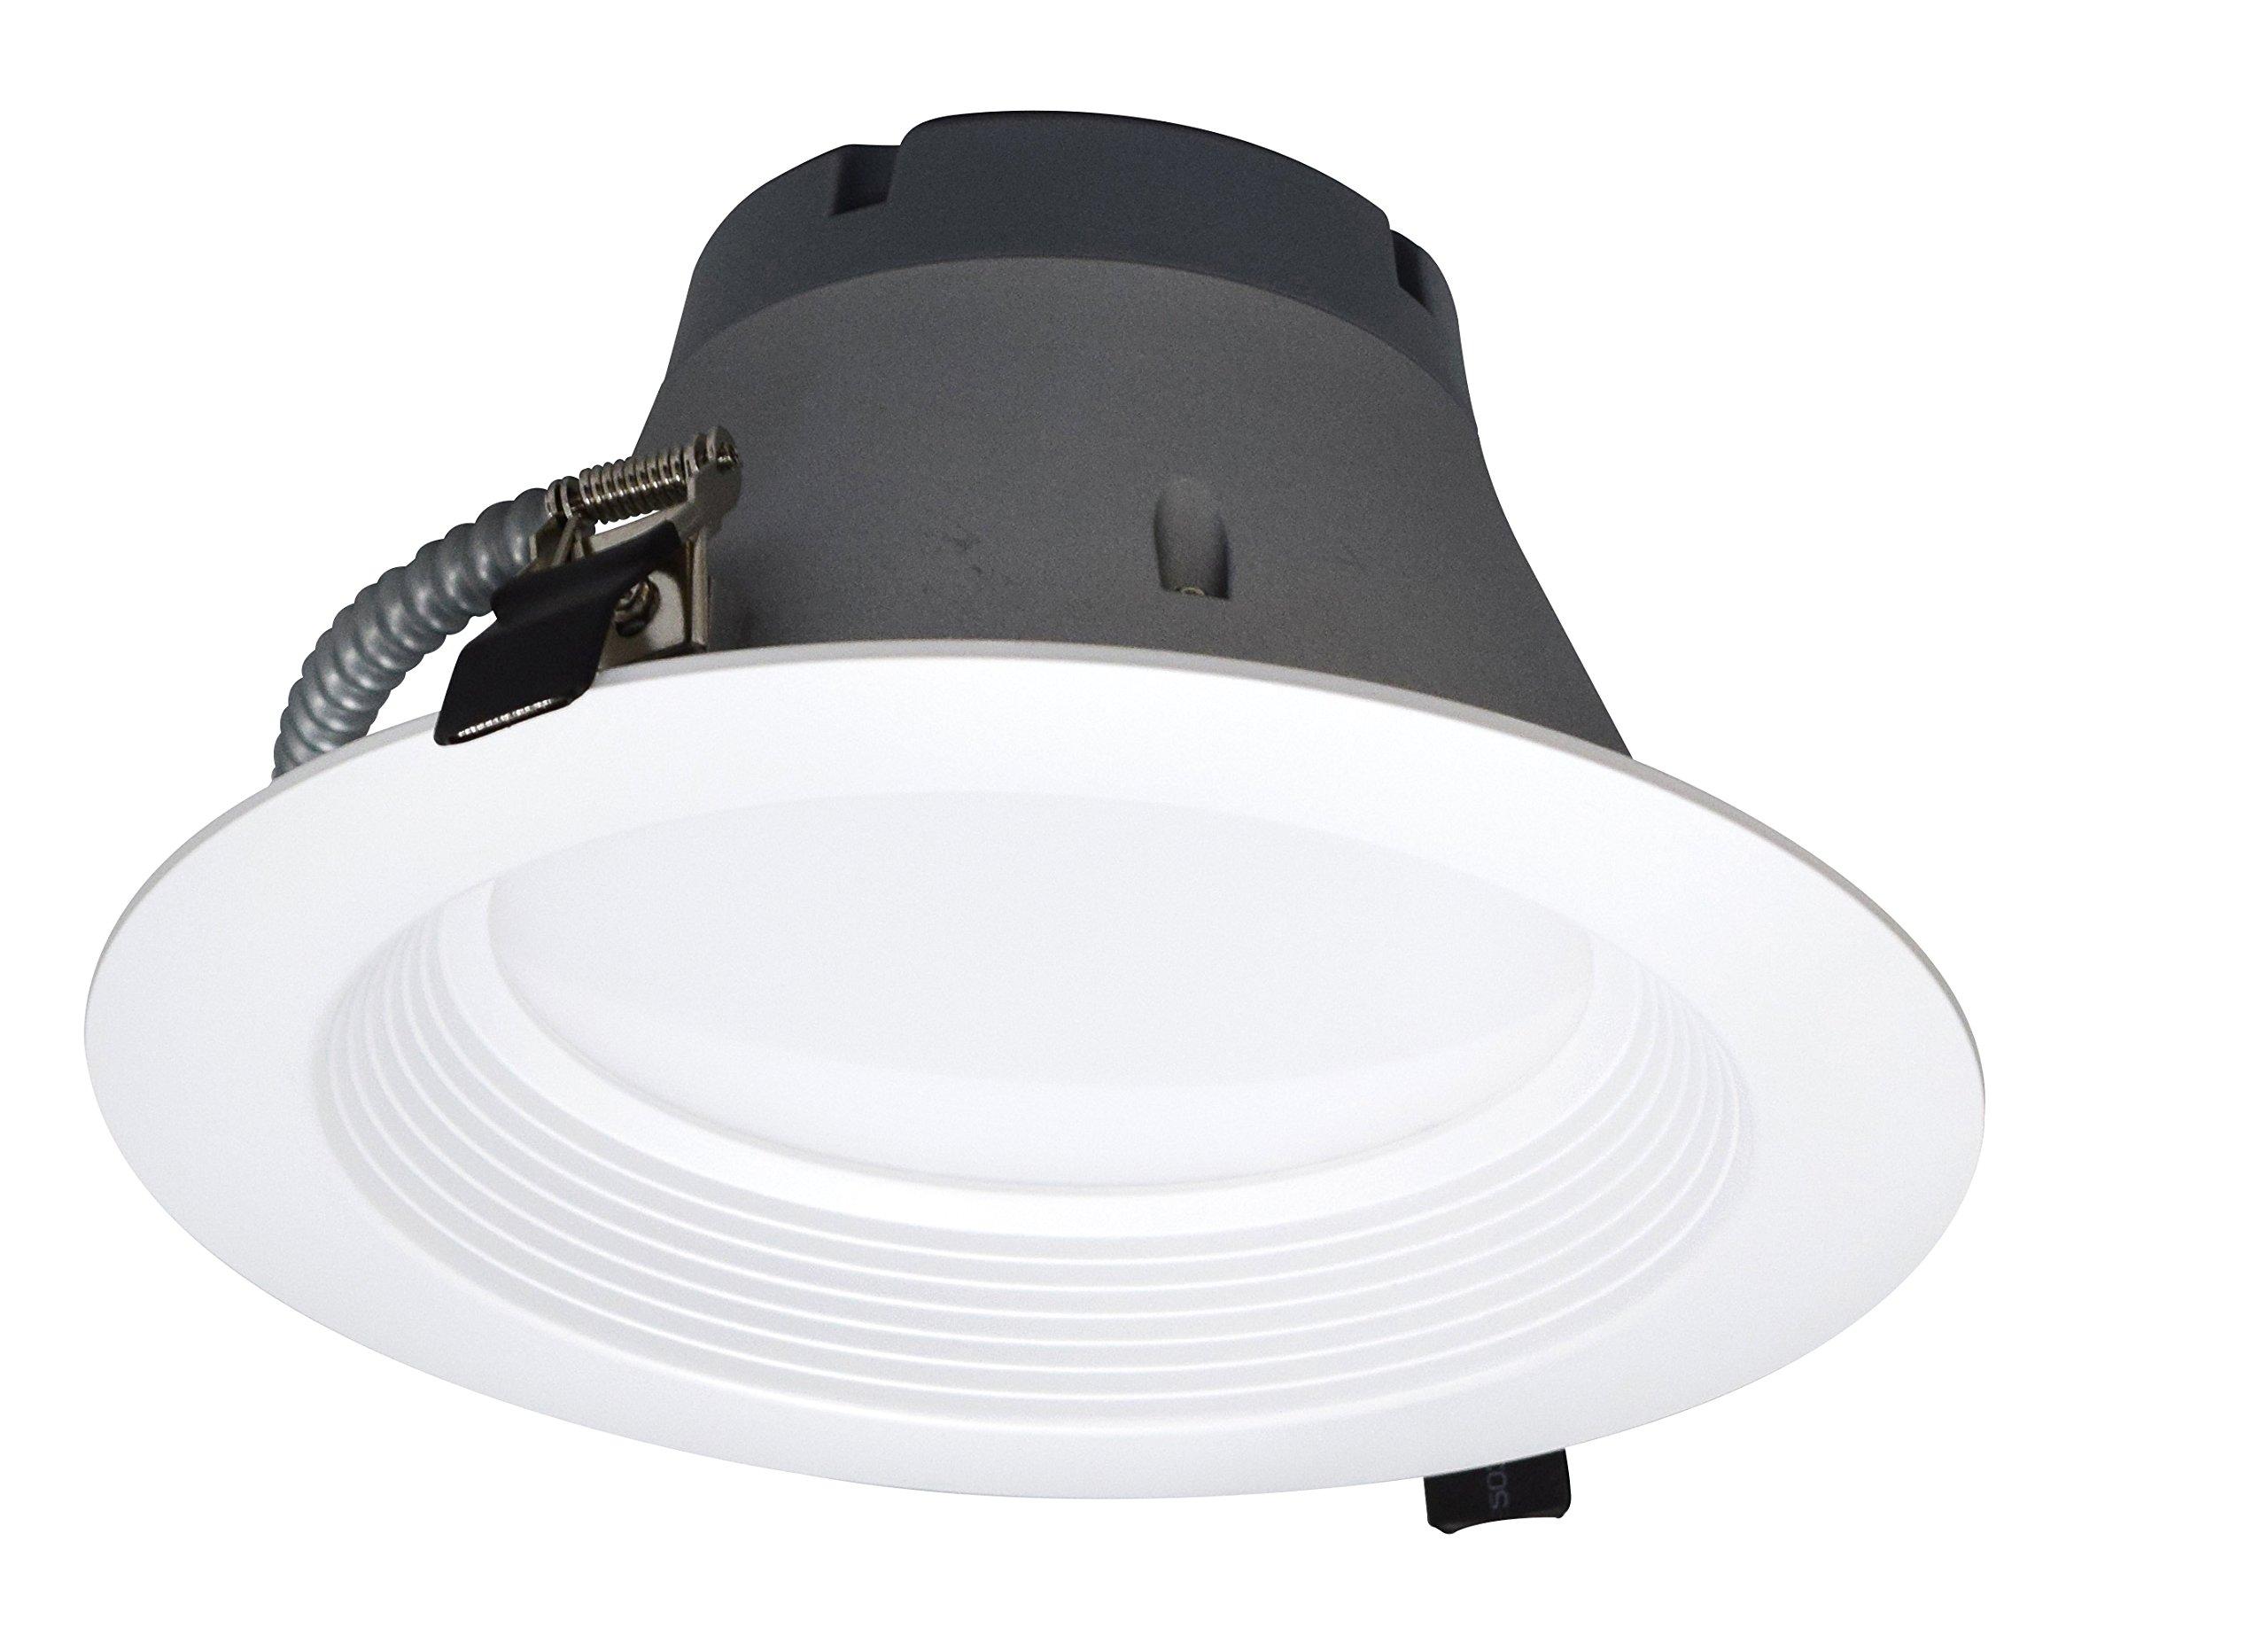 8'' Inch Architectural Recessed Down Light Retrofit Trim Dimmable 27 Watts 2000 Lumens (5000 Kelvin)